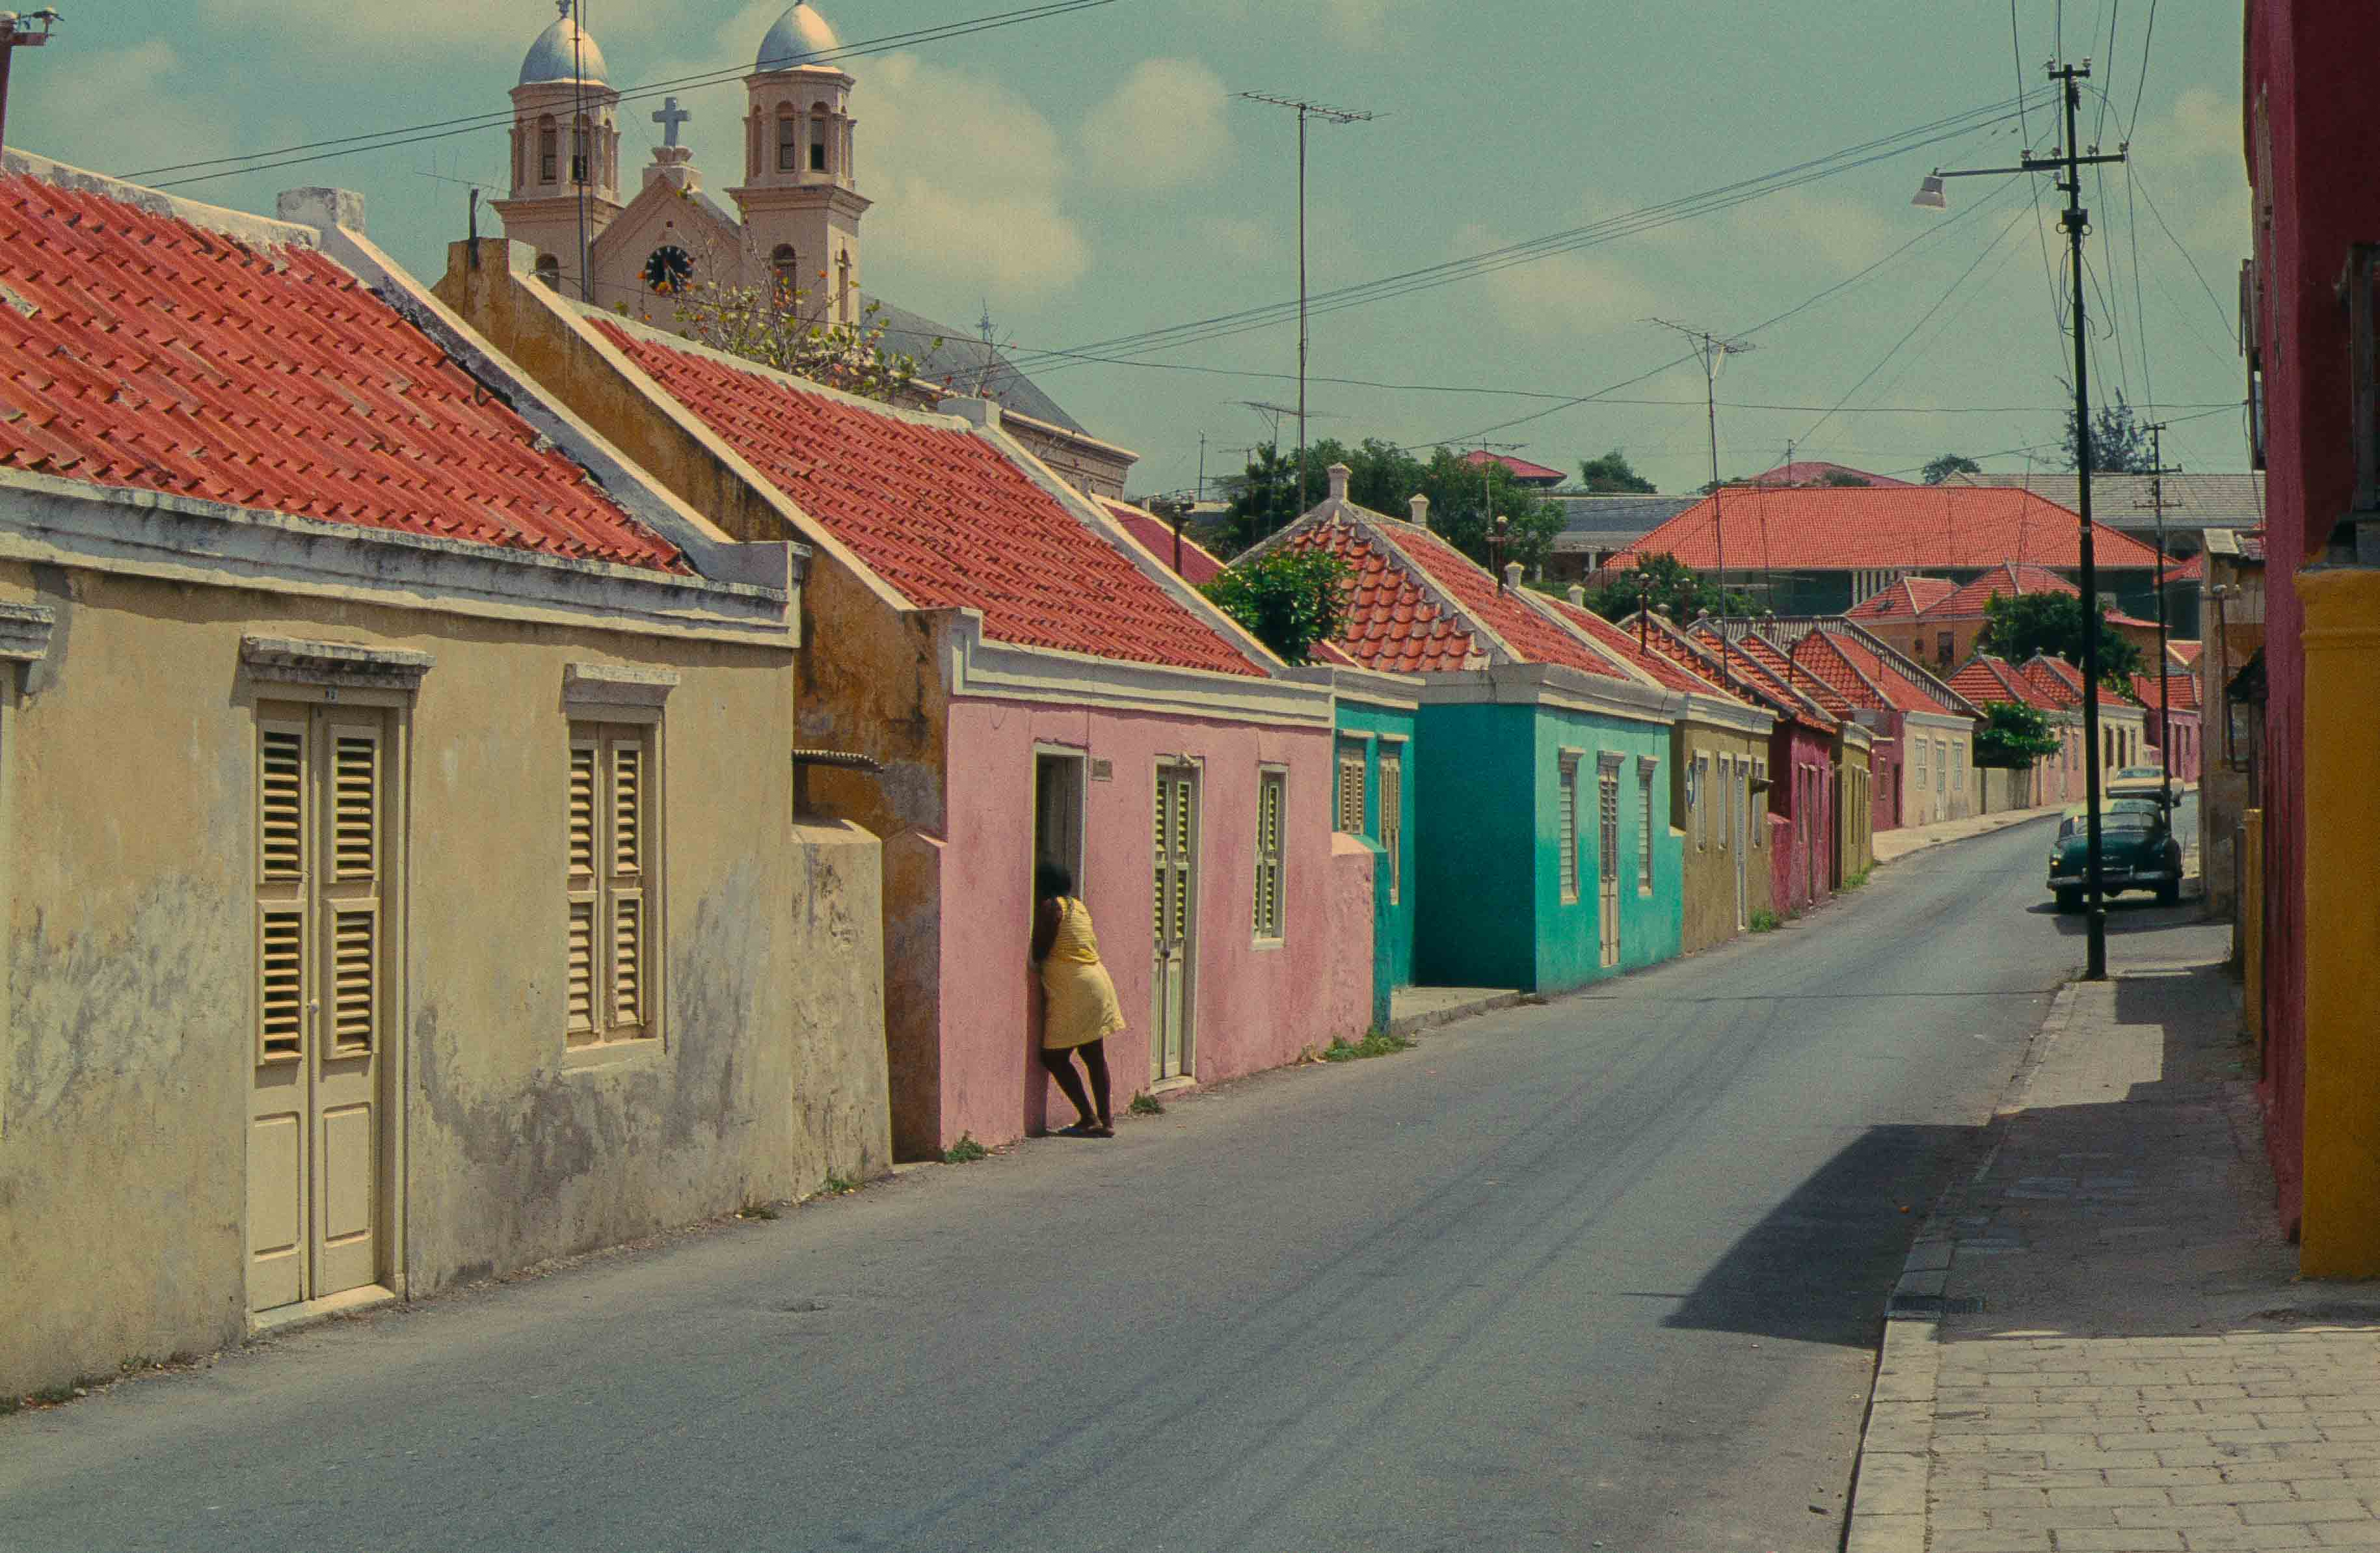 643. Suriname